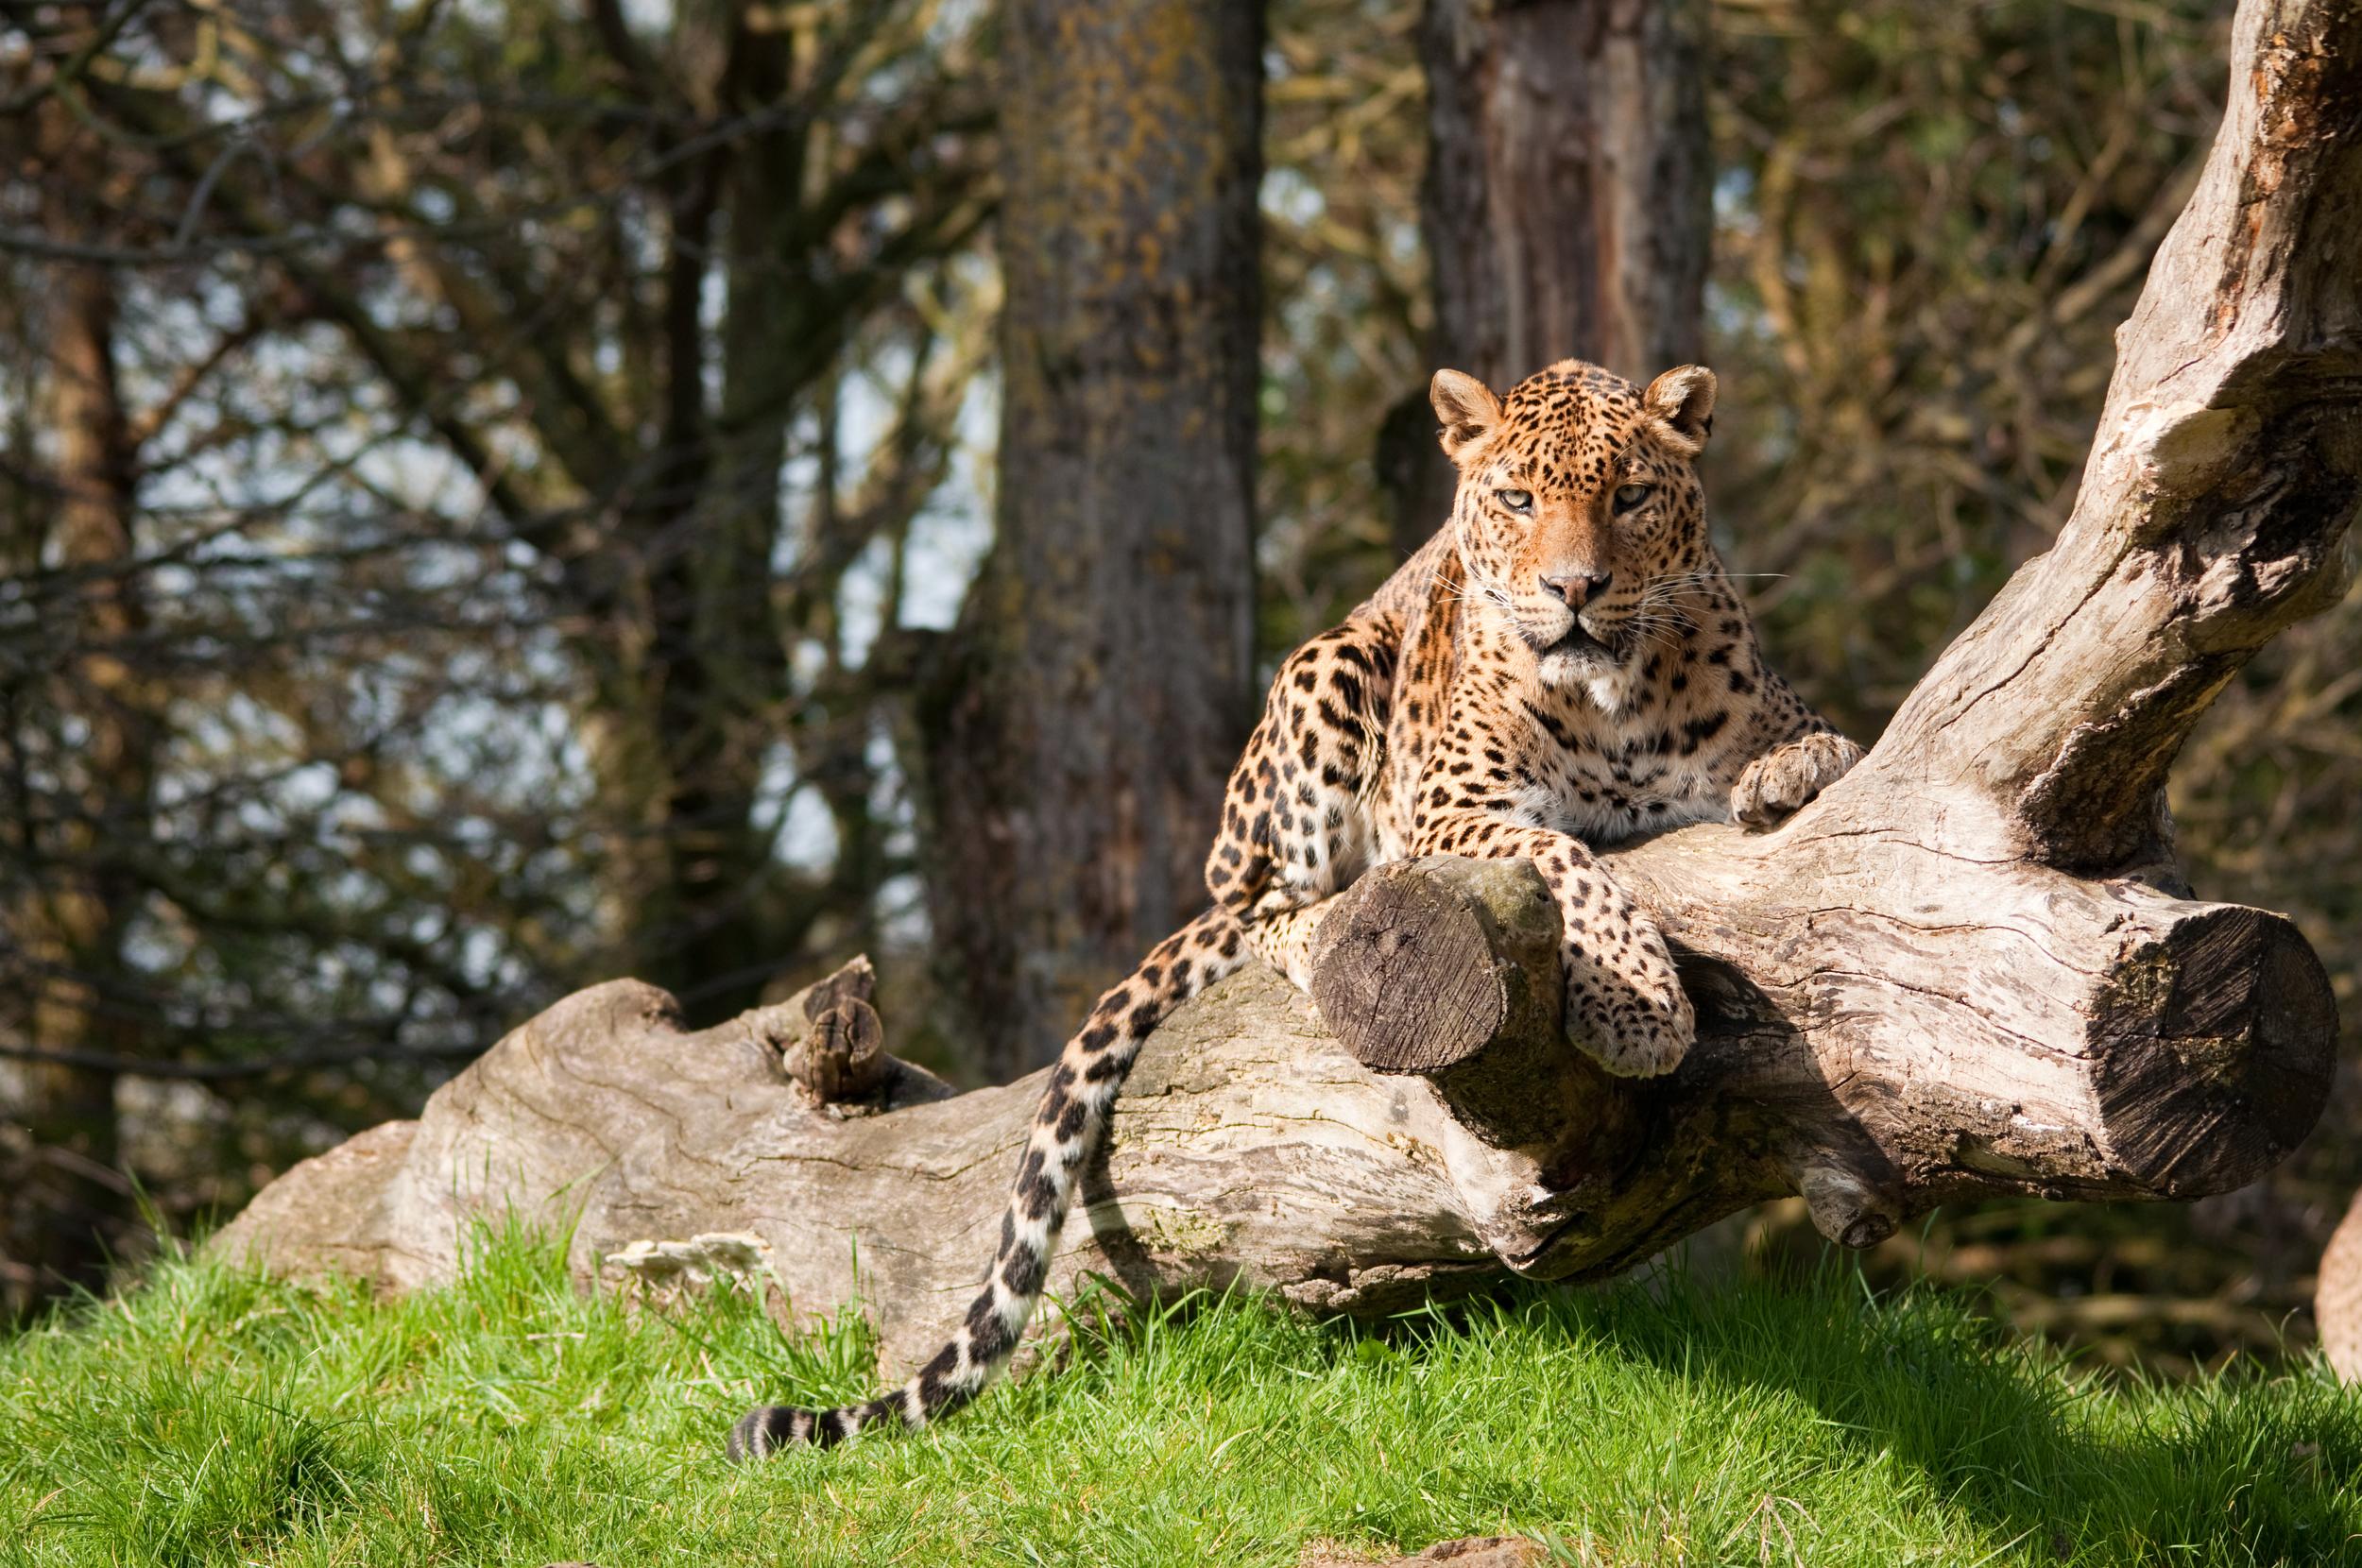 invite-to-paradise-sri-lanka-honeymoon-holiday-wildlife-leopard-safari-6.jpg